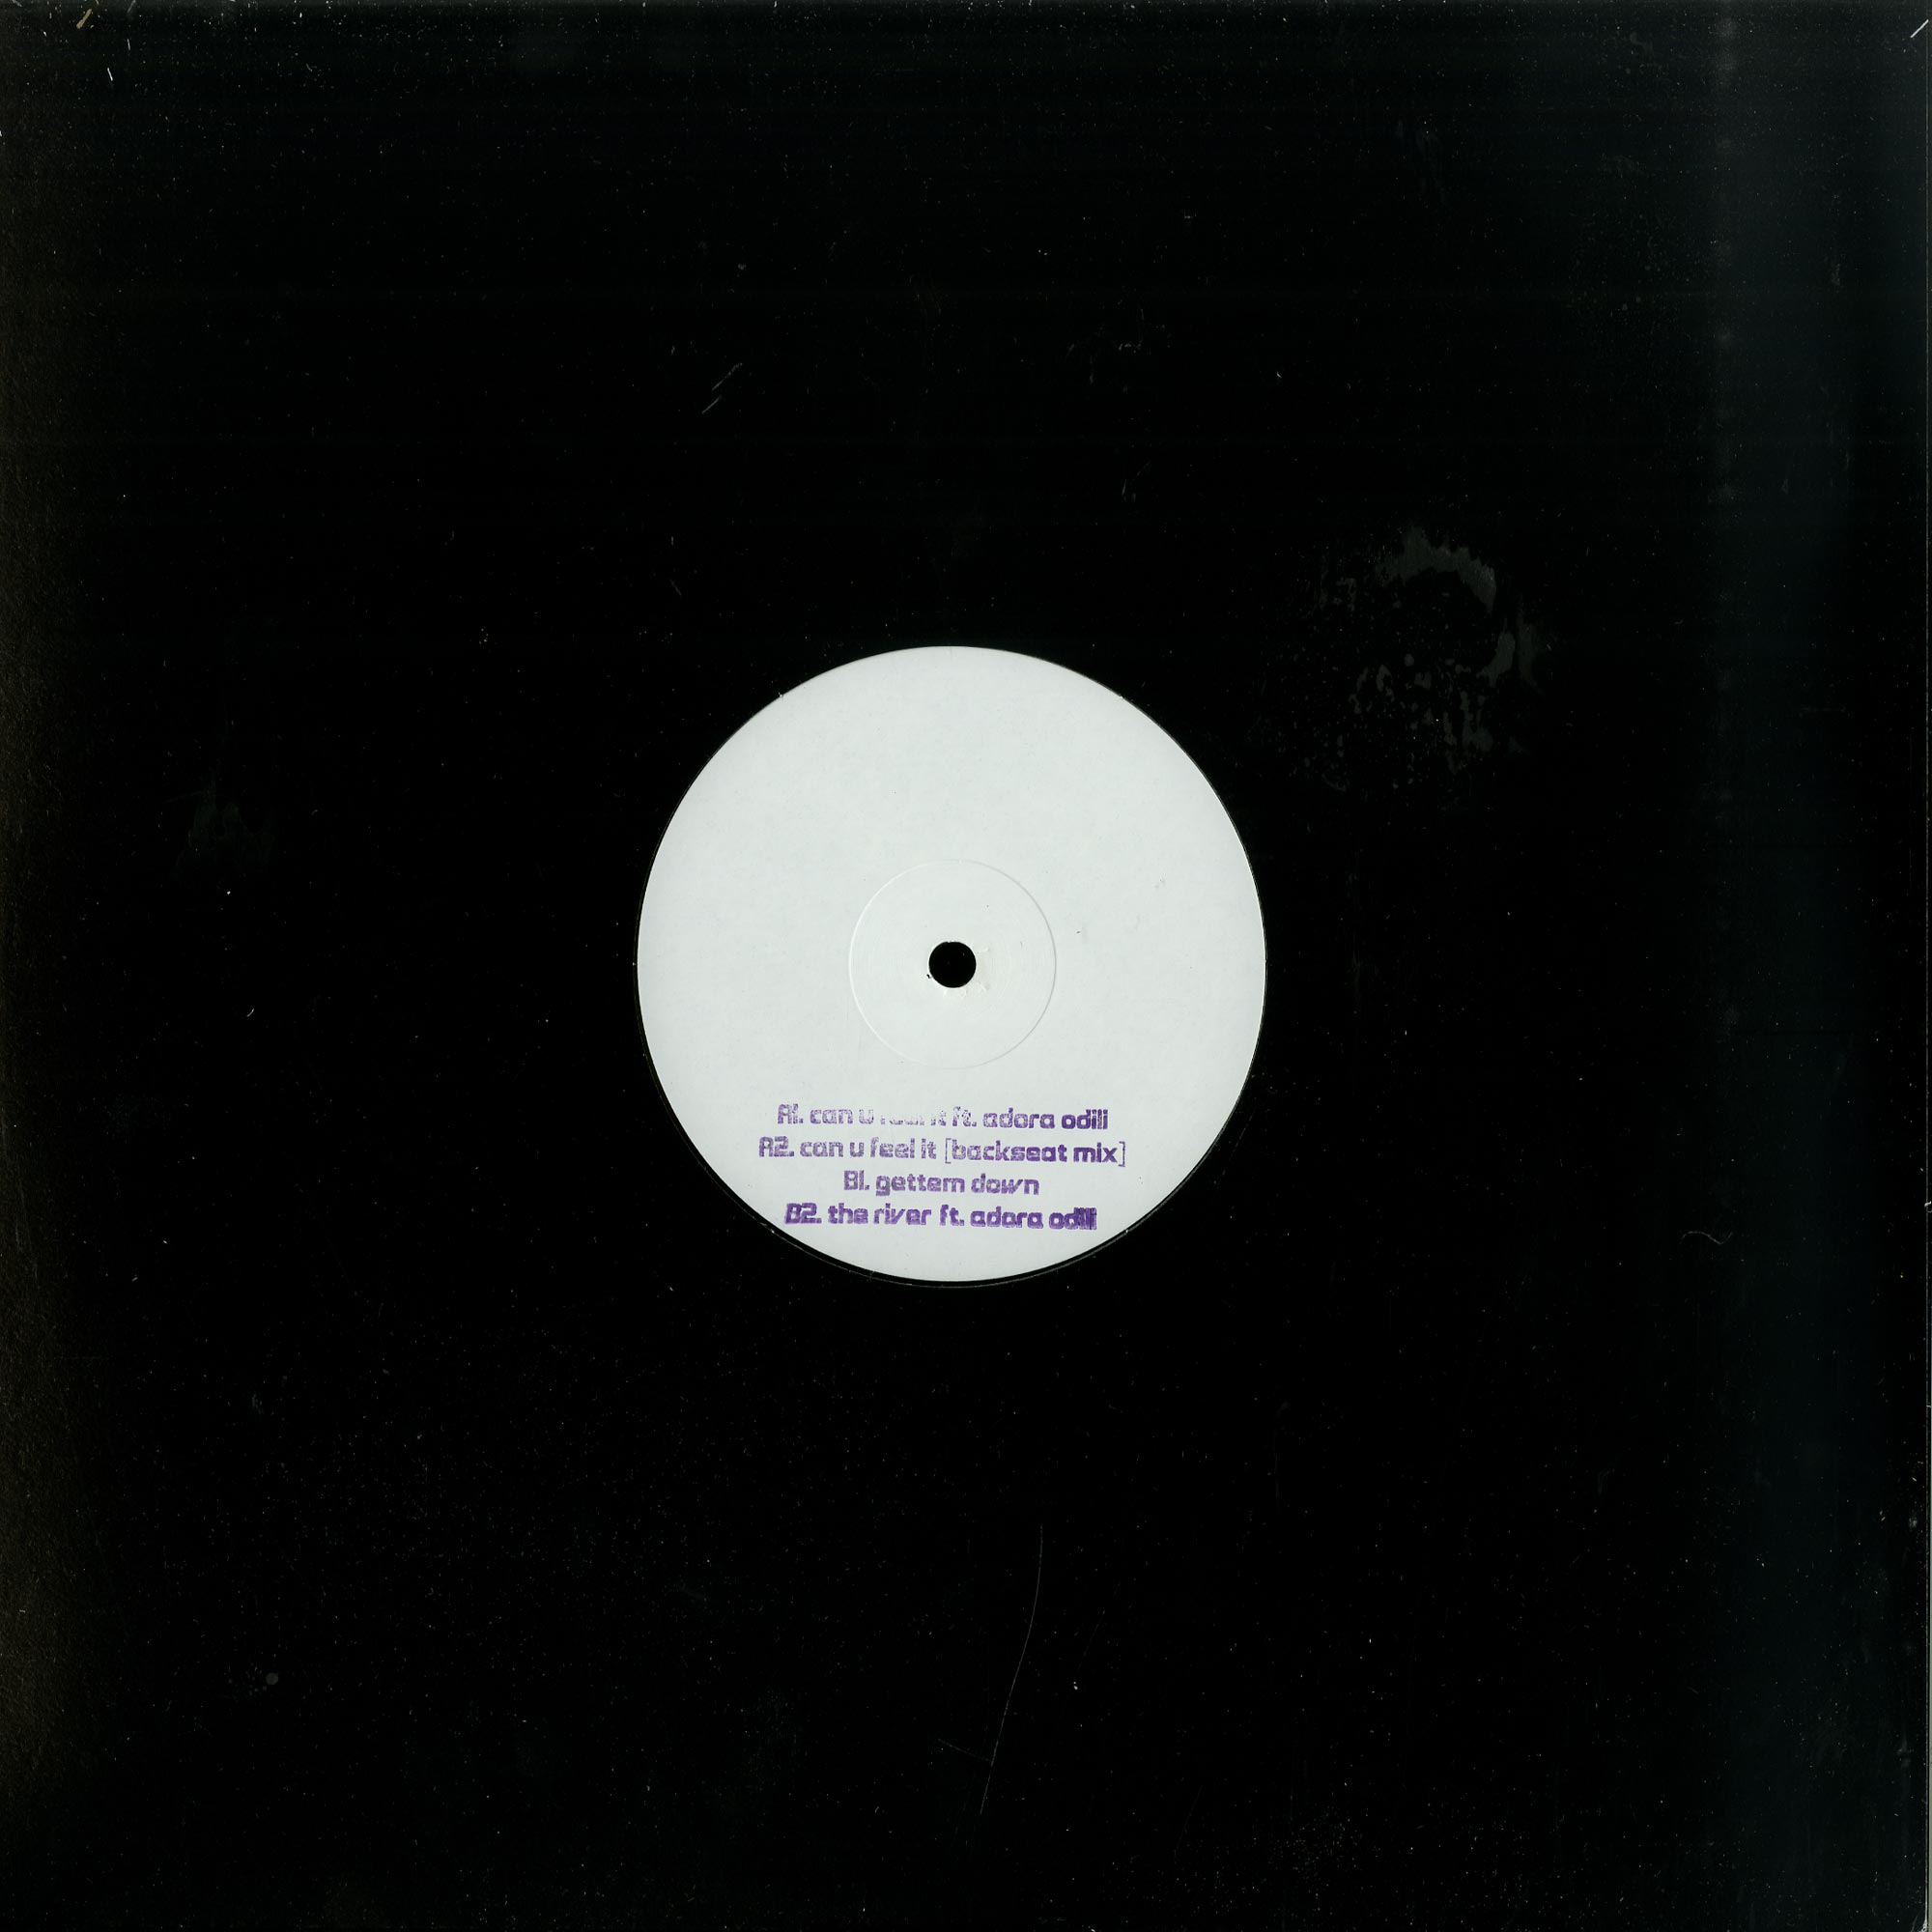 Danielle Arielli - CAN U FEEL IT EP